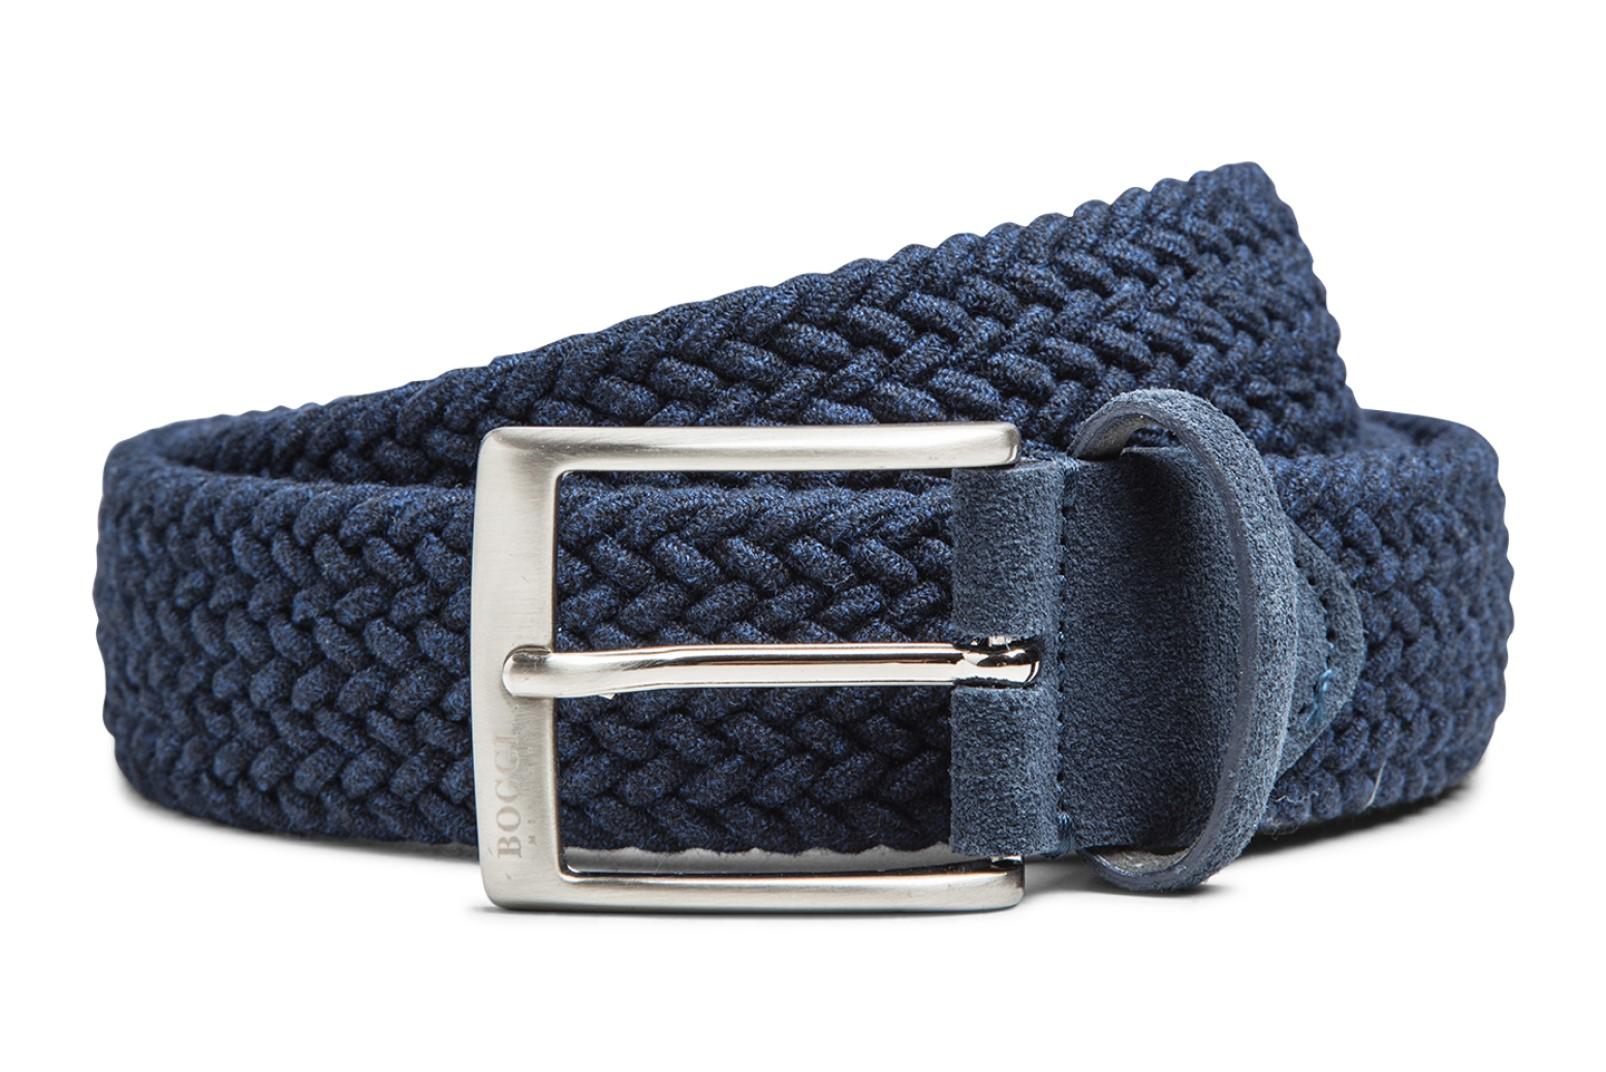 Textile belt by Boggi Milano BO17C010301